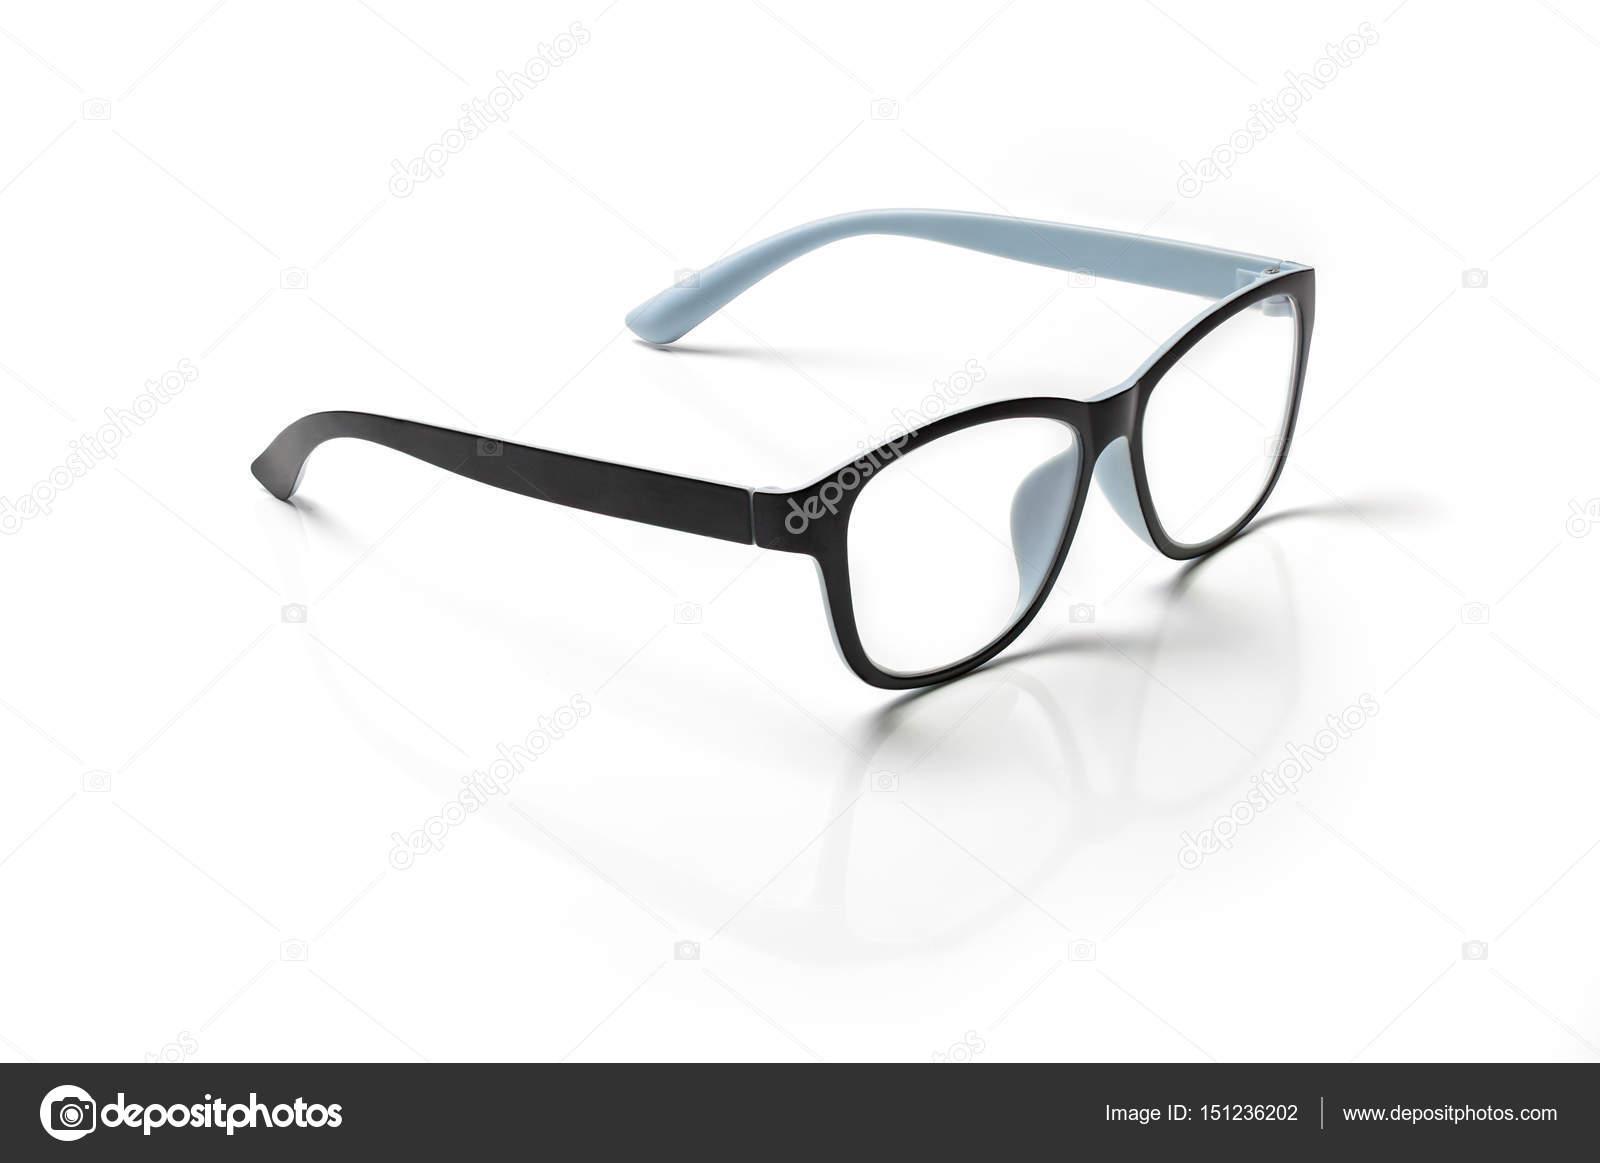 bbcebf64ee Υπολογιστή γυαλιά closeup απομονώνονται σε λευκό φόντο — Φωτογραφία Αρχείου